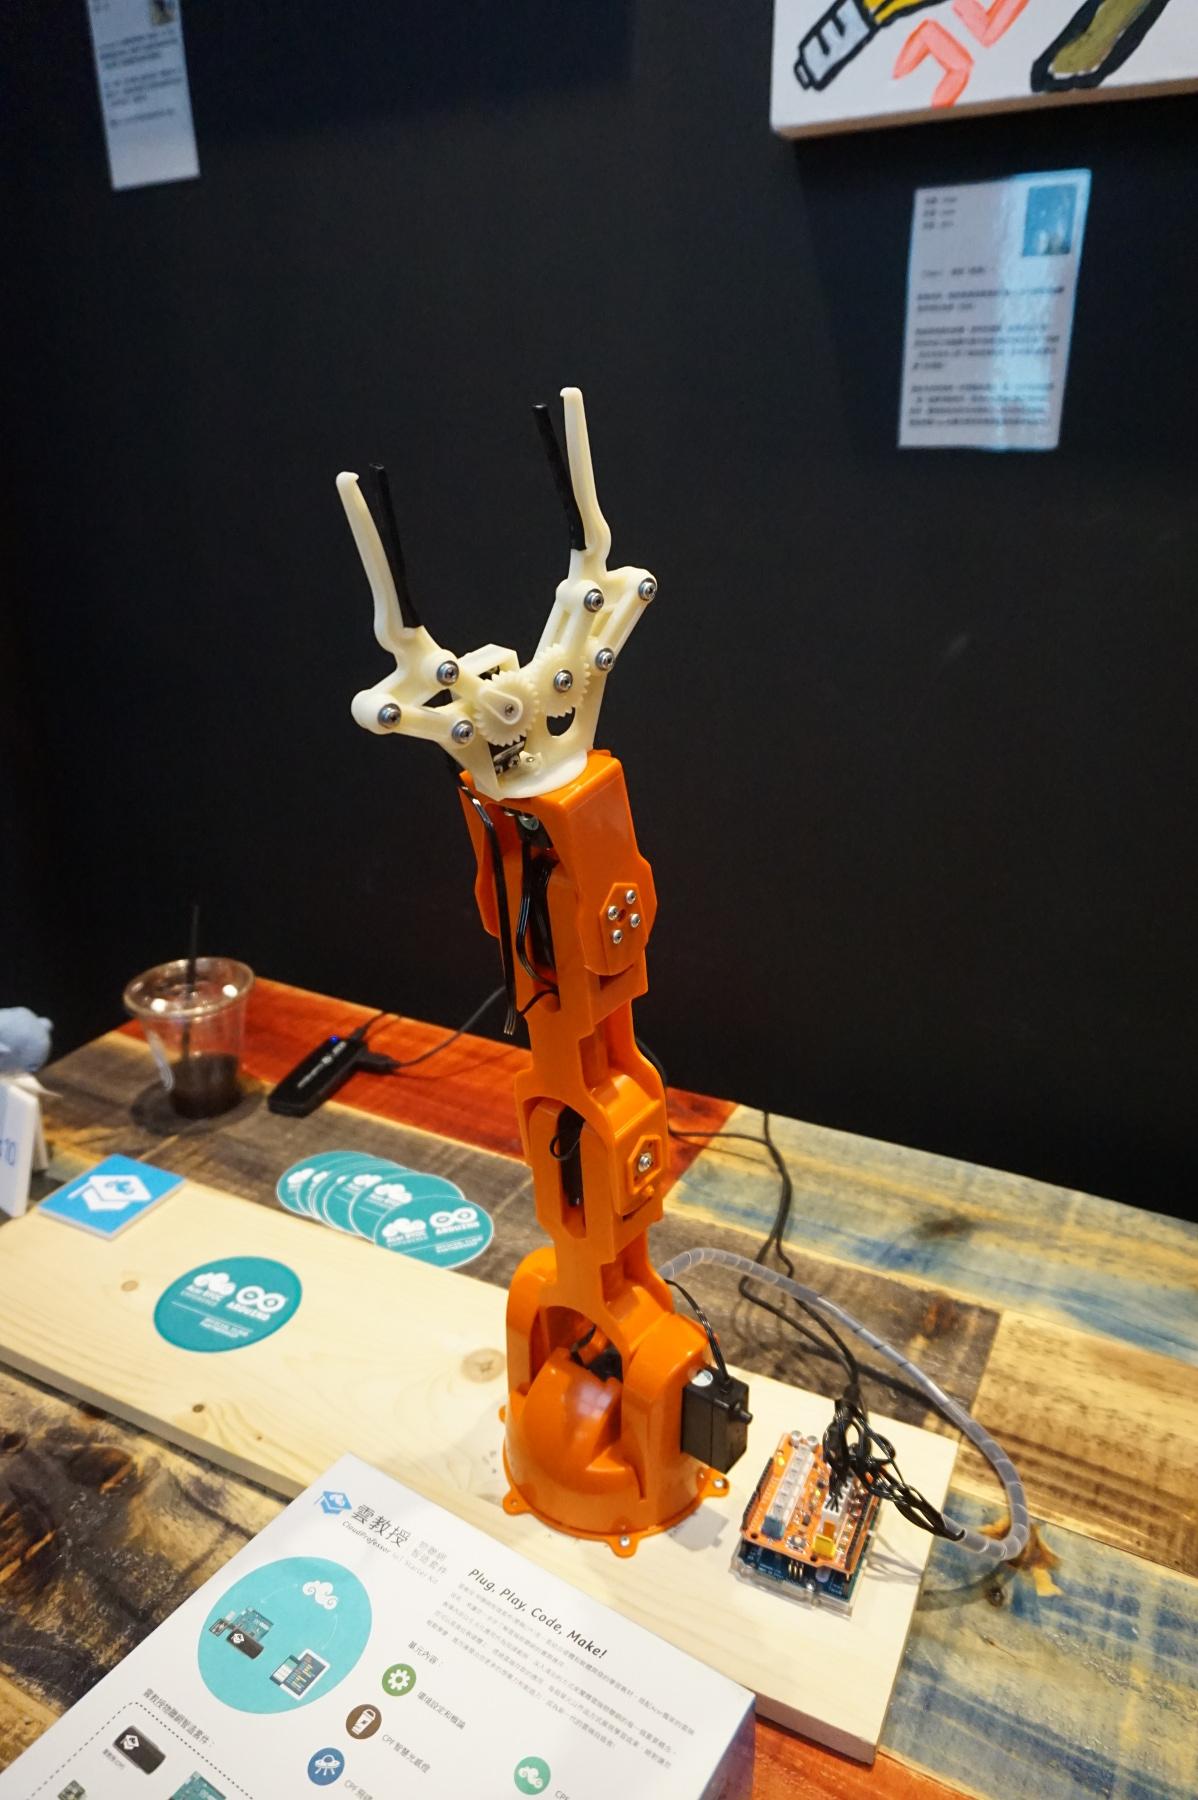 Acer-Ardunio-robot-hand